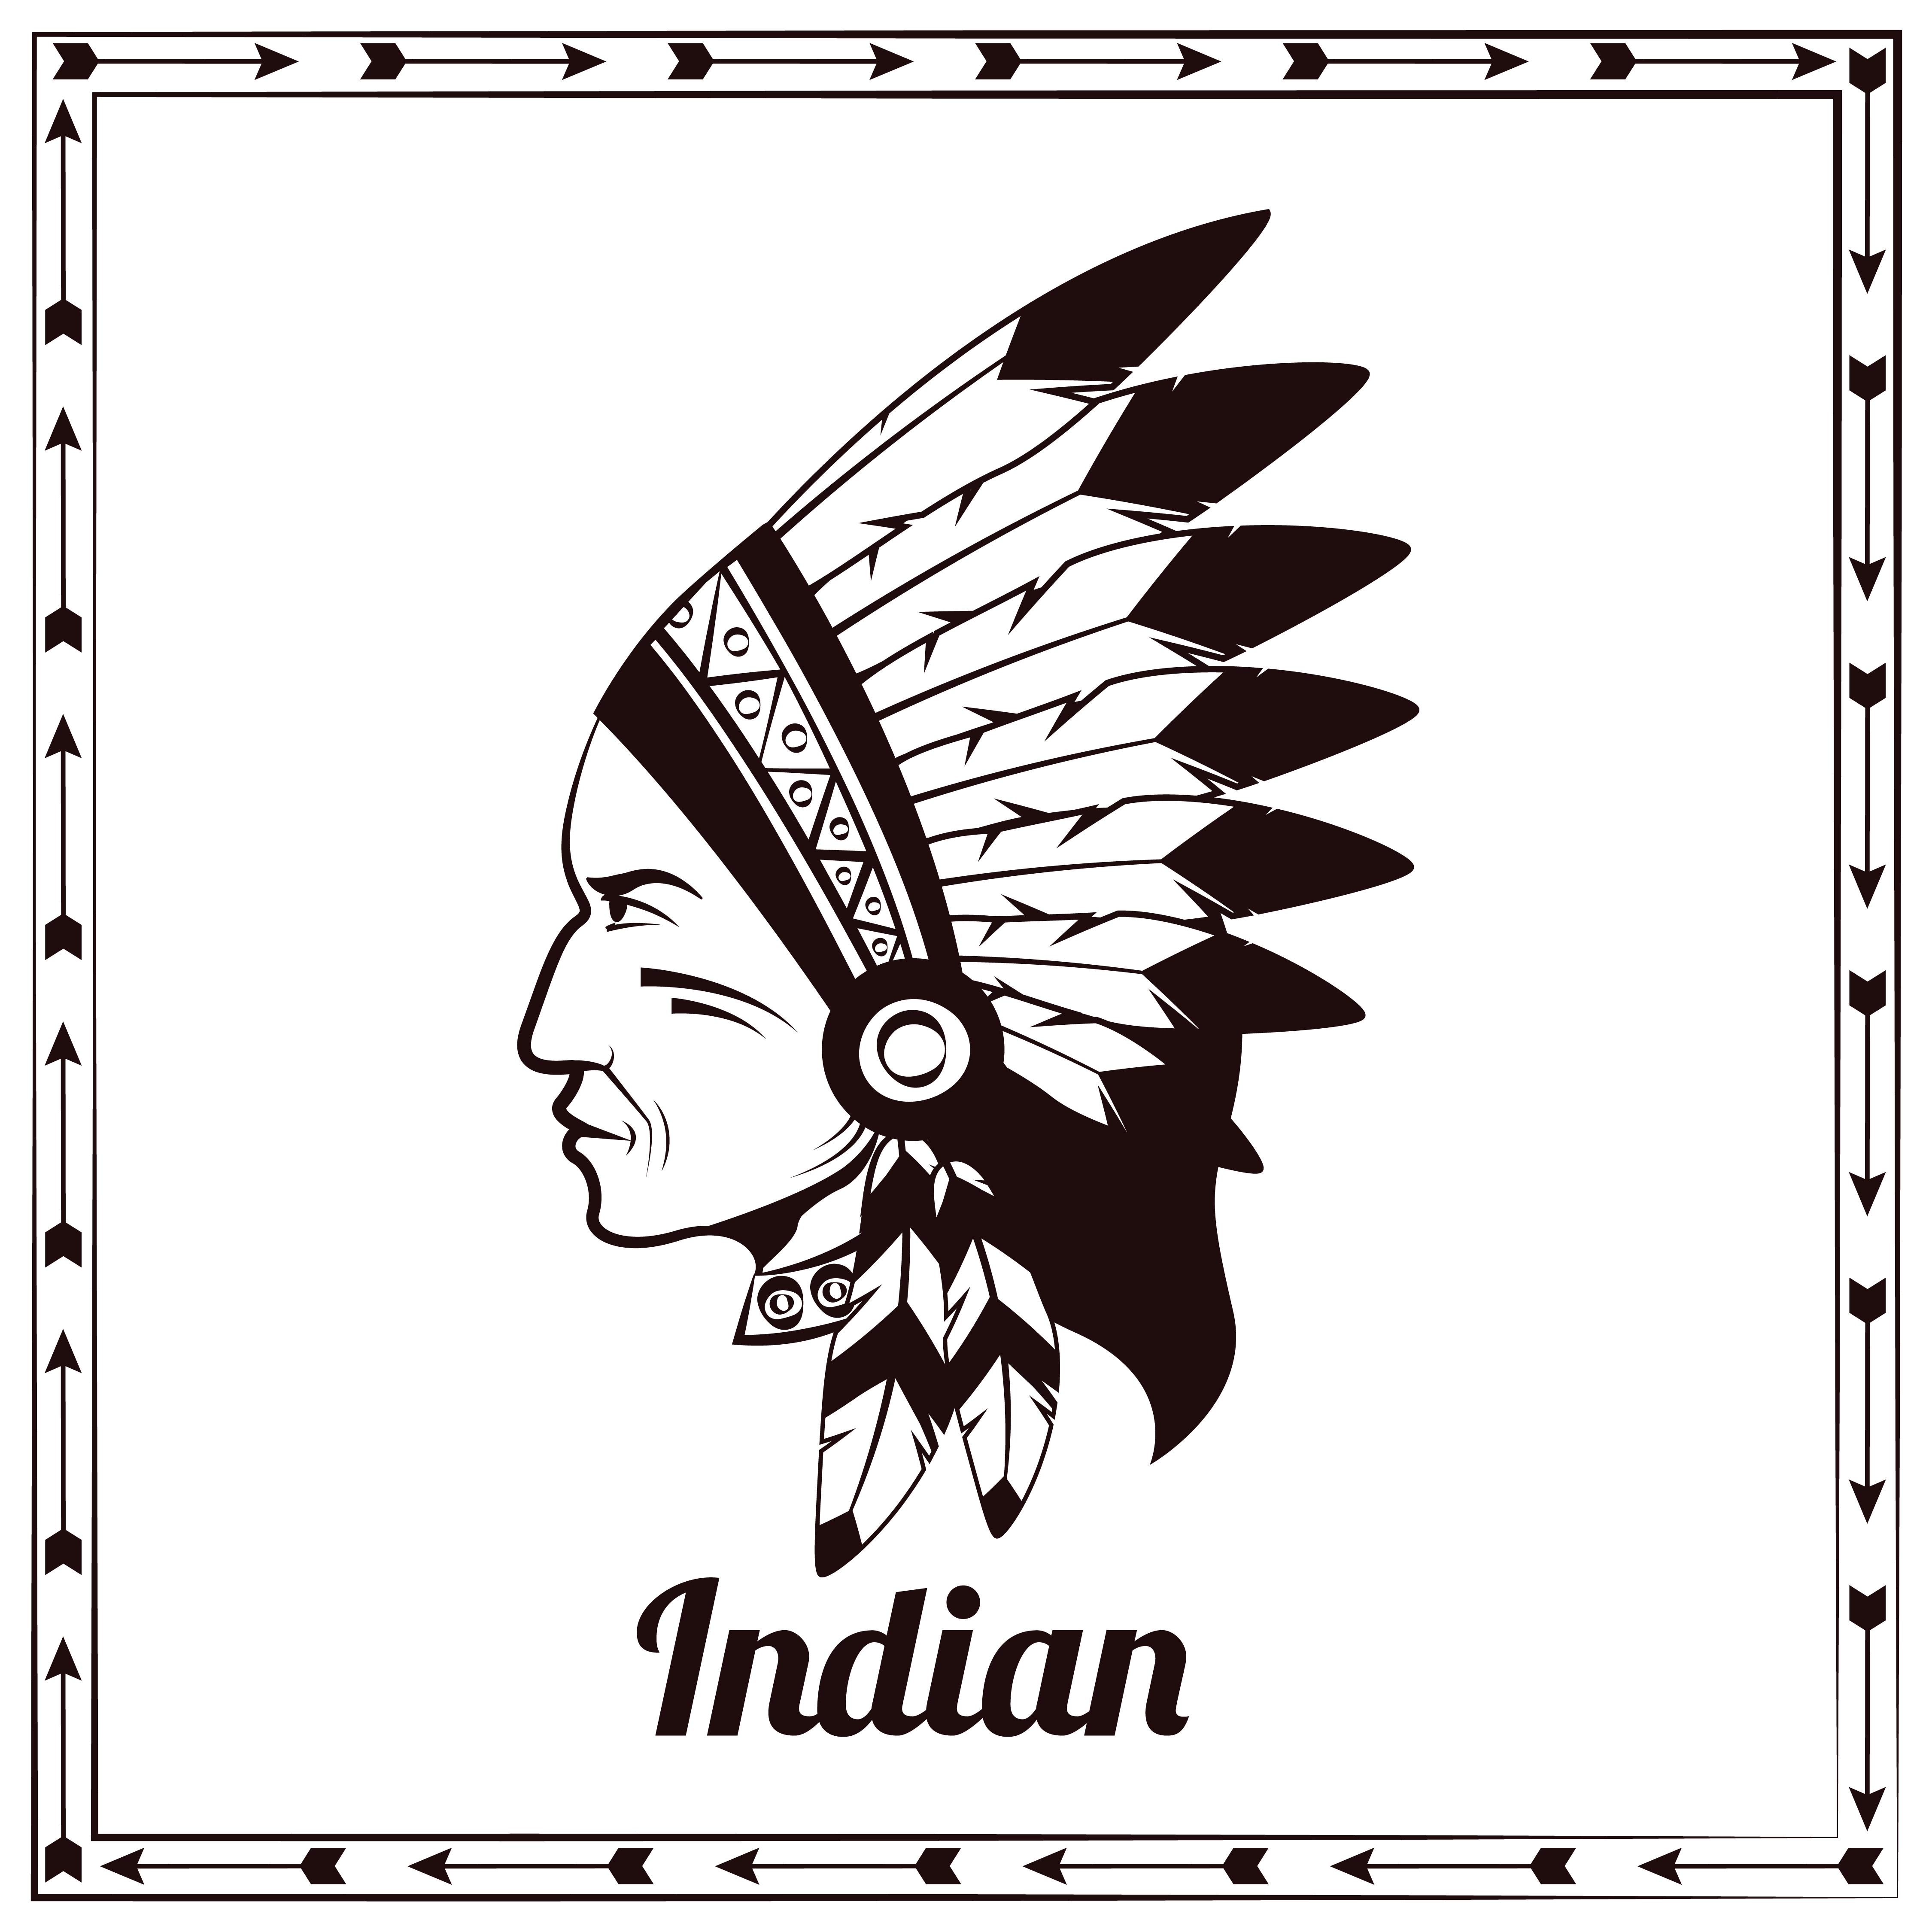 Esboco Preto Do Chefe Indio Americano Download Vetores Gratis